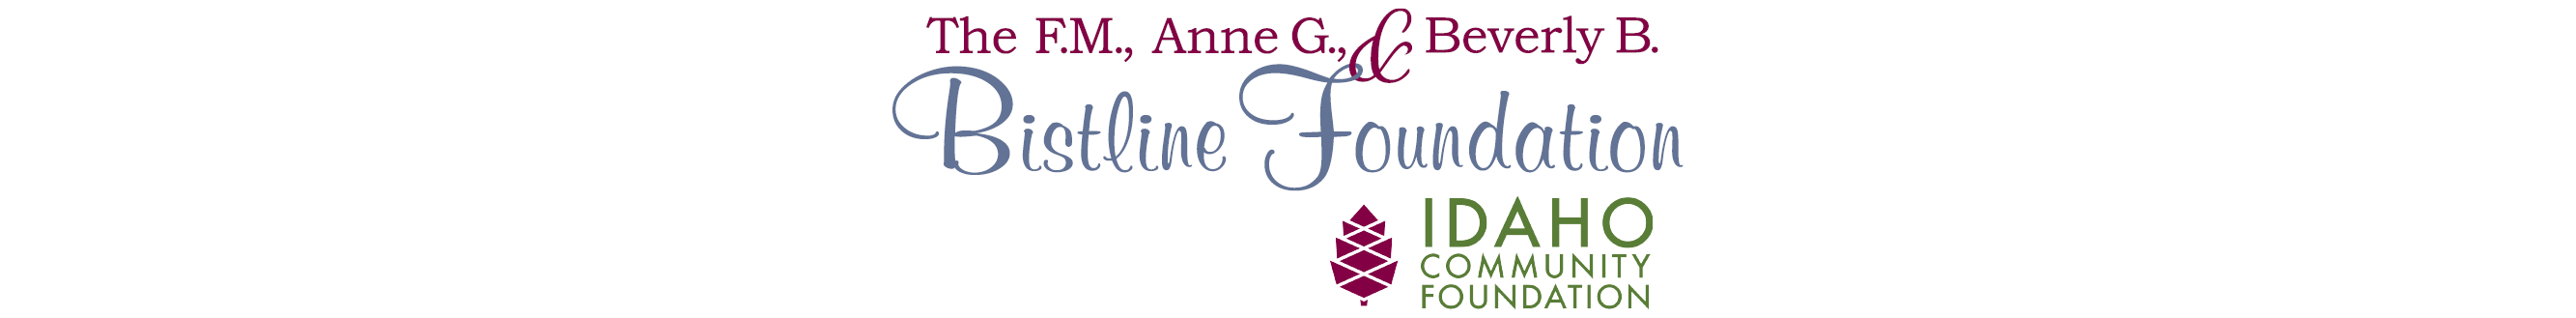 Bistline Foundation